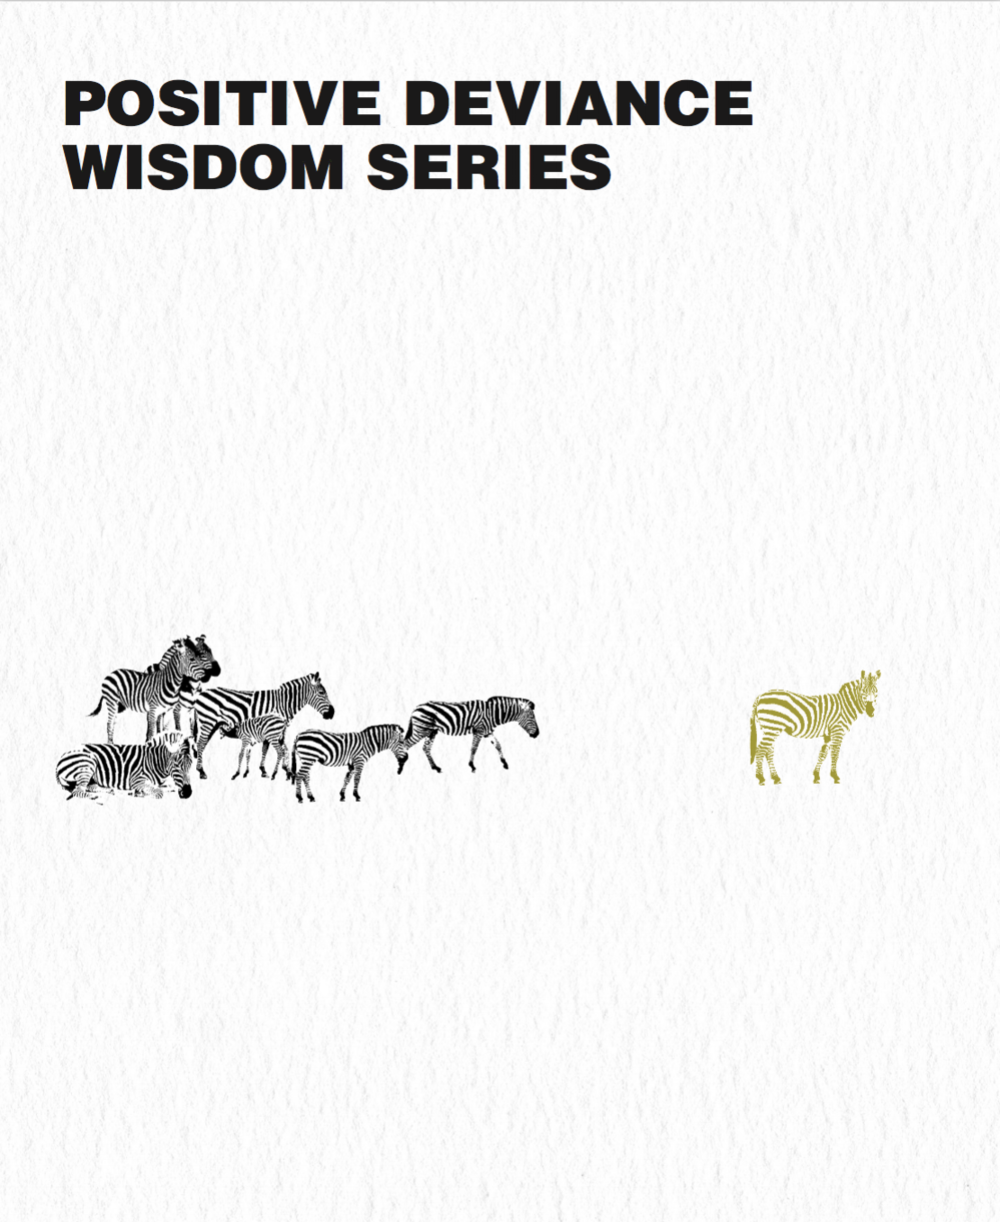 wisdomseries_cover